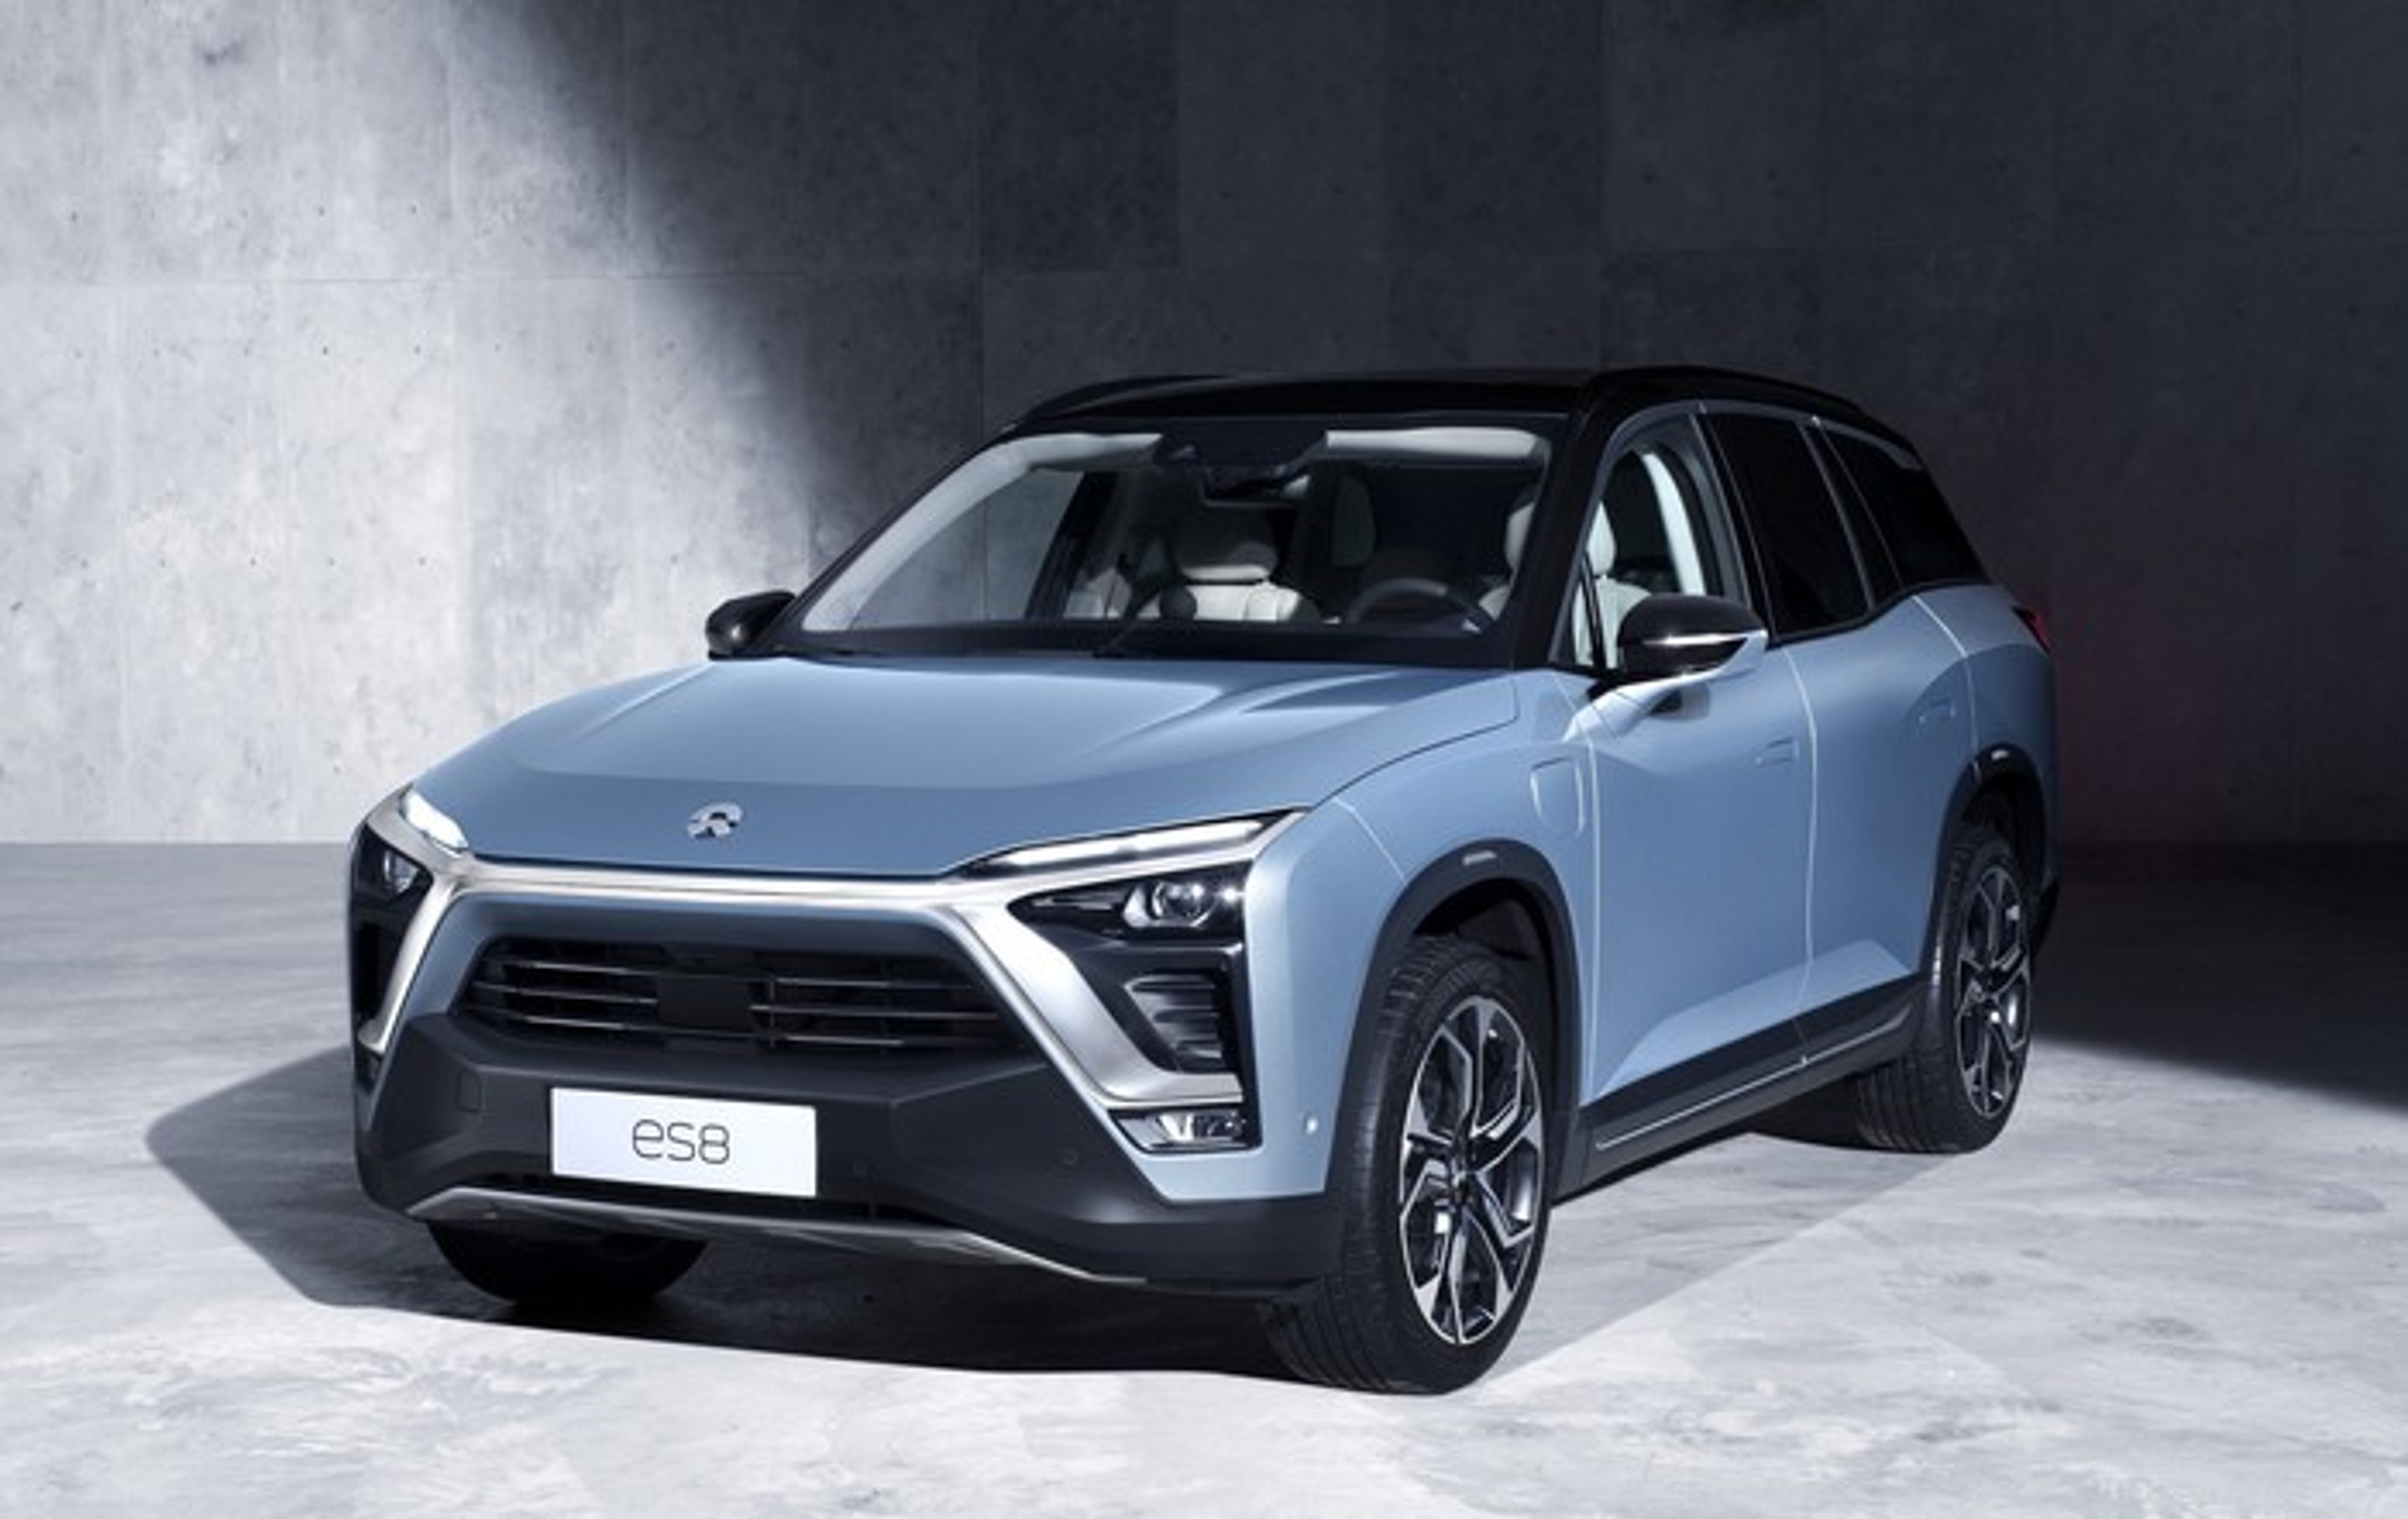 A blue NIO ES8, an upscale SUV with sleek, angular styling.